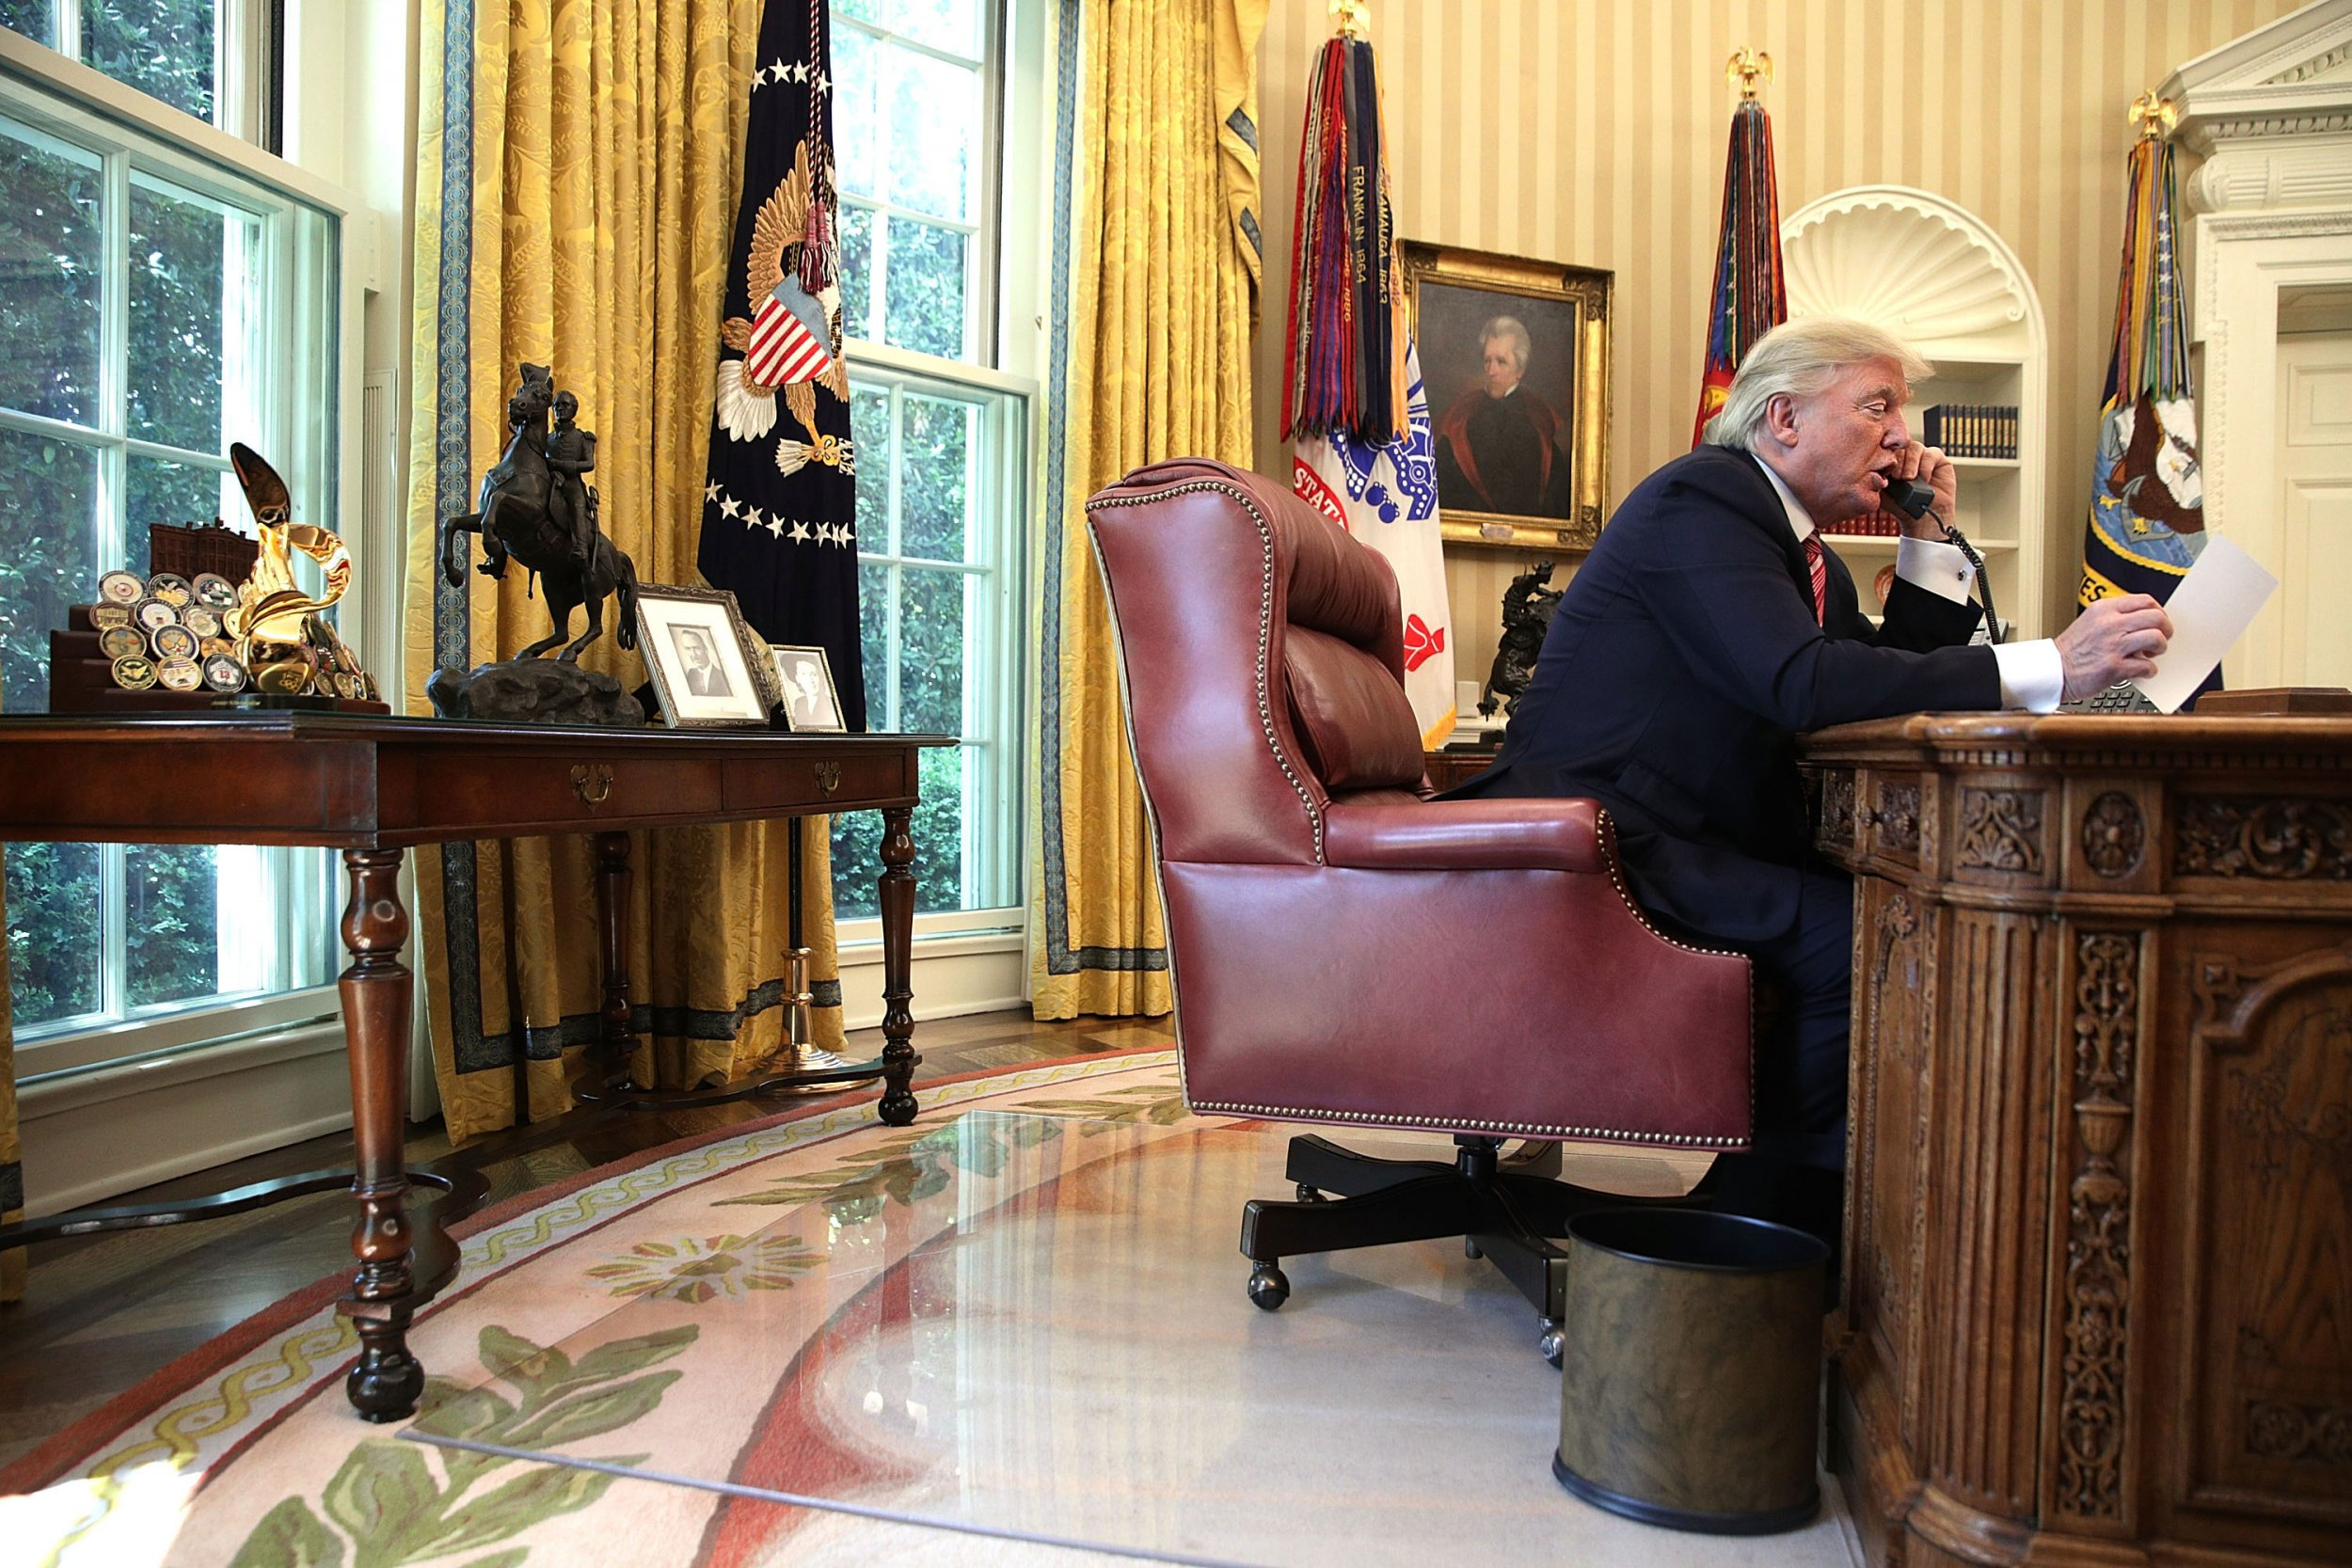 Trumpu0027s White House Makeover Cost $1.75 Million